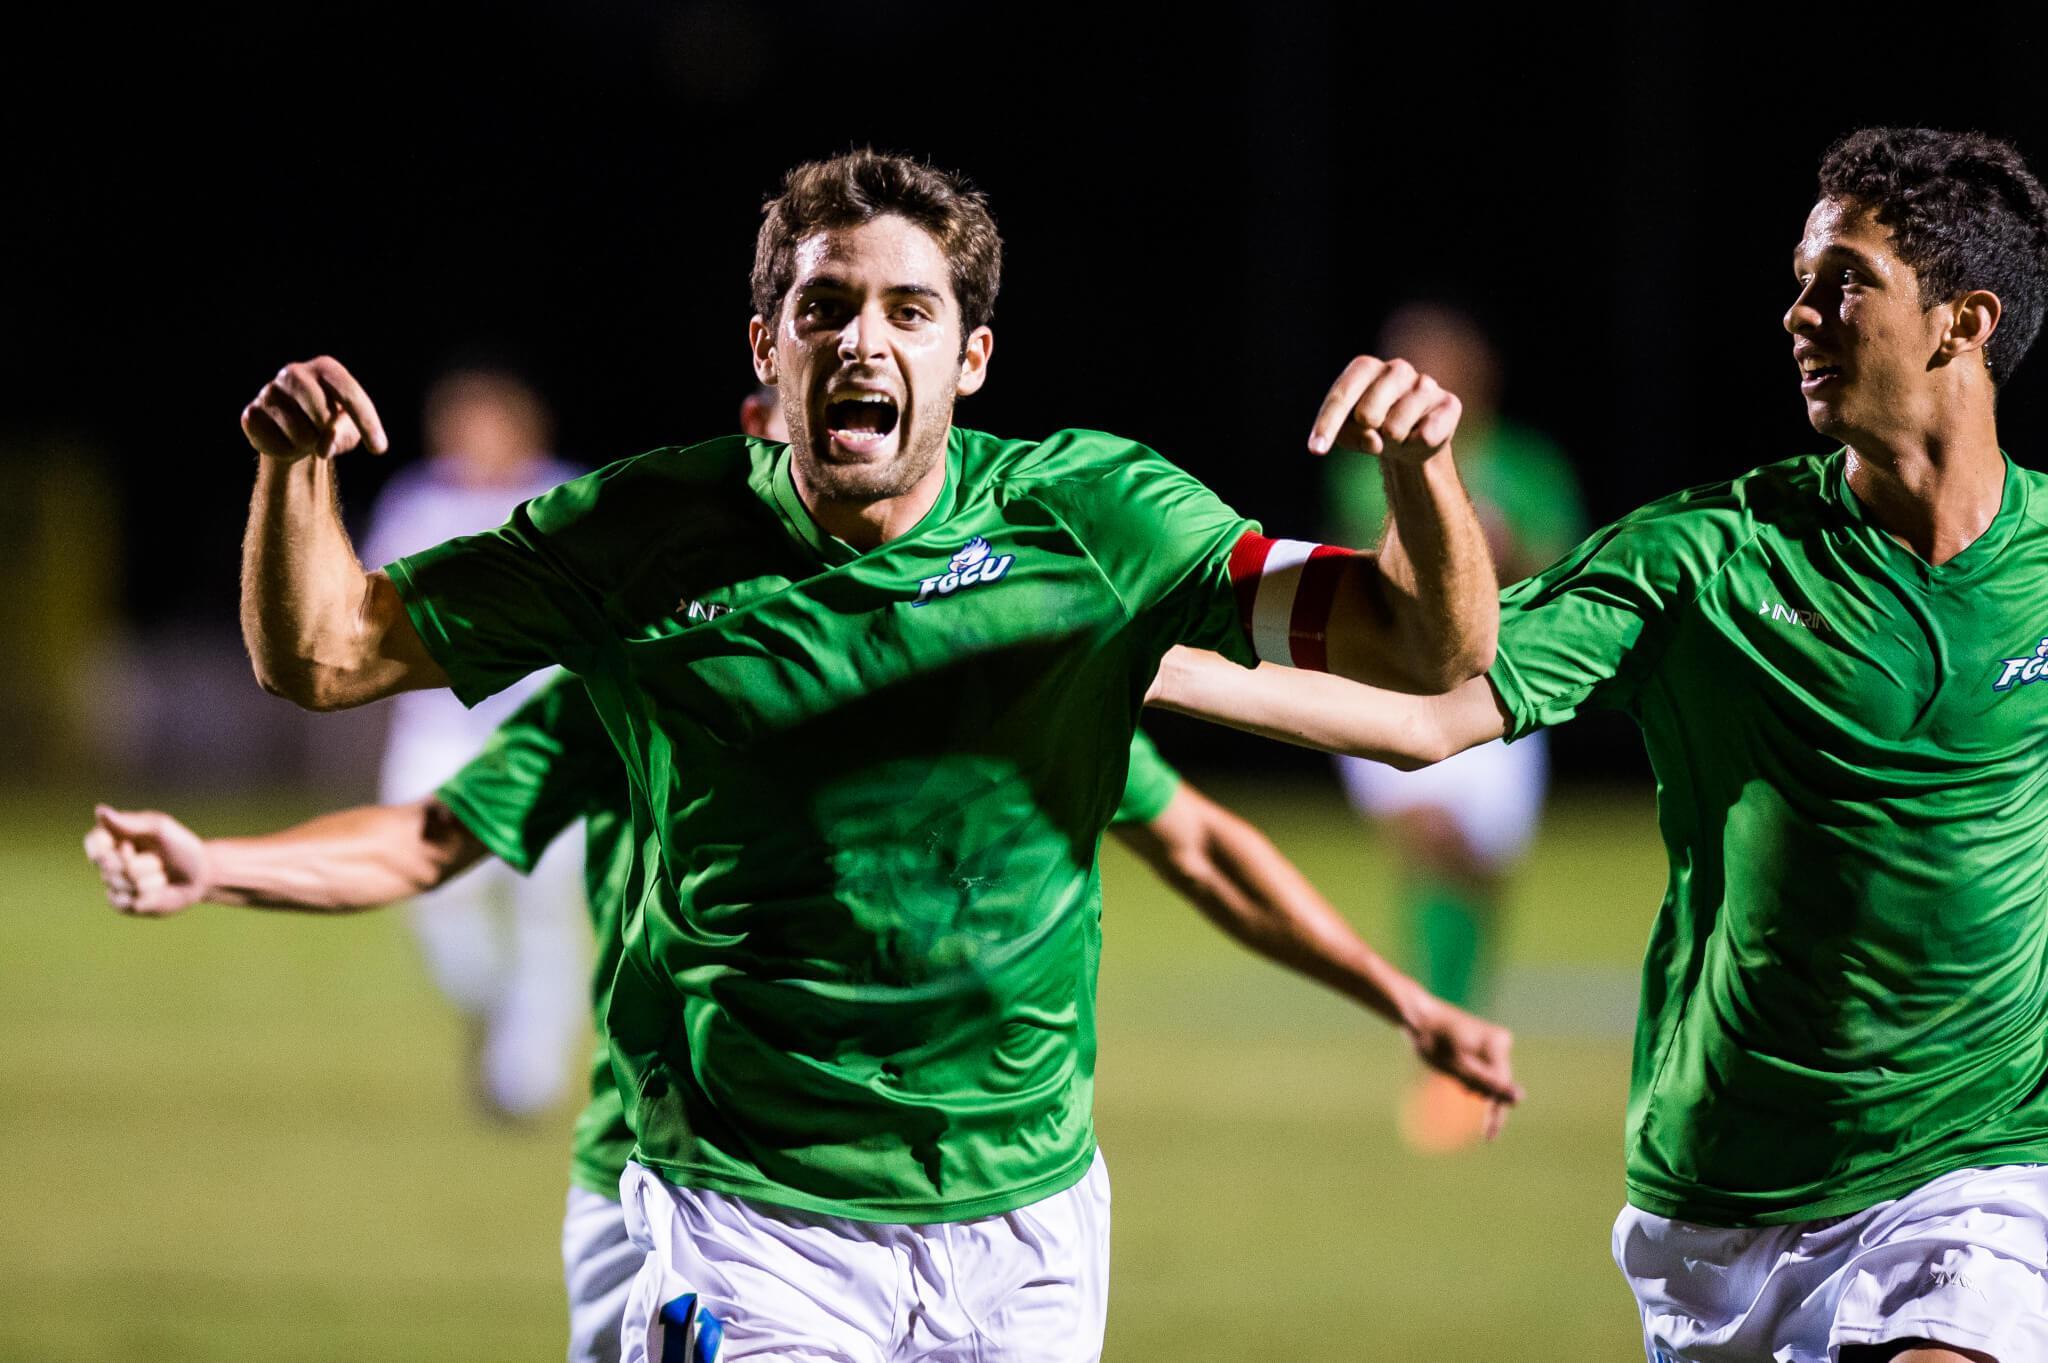 No. 20 FGCU men's soccer to host Jacksonville in the ASUN Men's Soccer Championship final